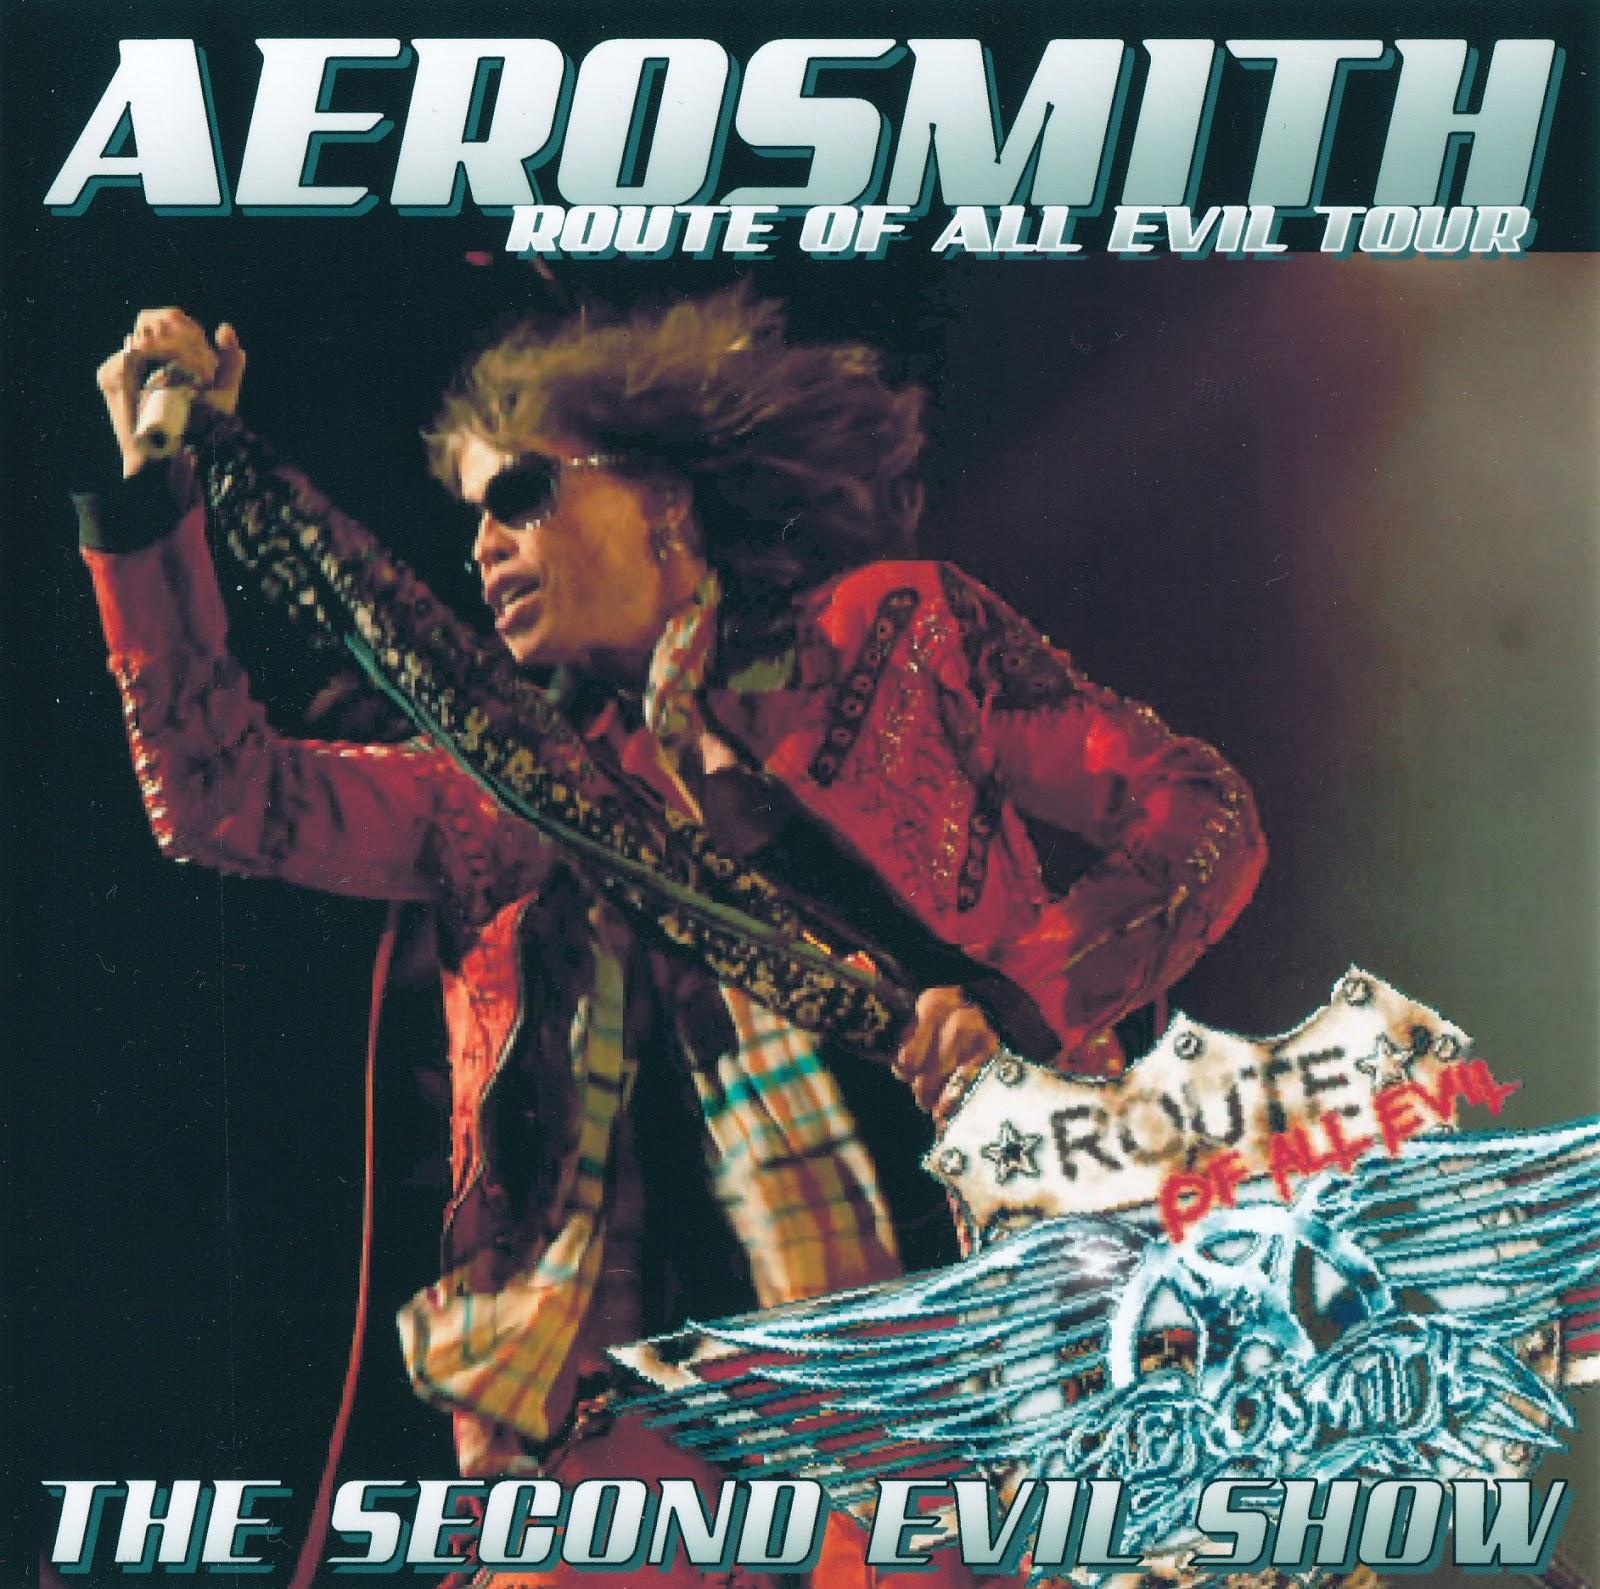 Aerosmith Bootlegs Cover Arts The Second Evil Show